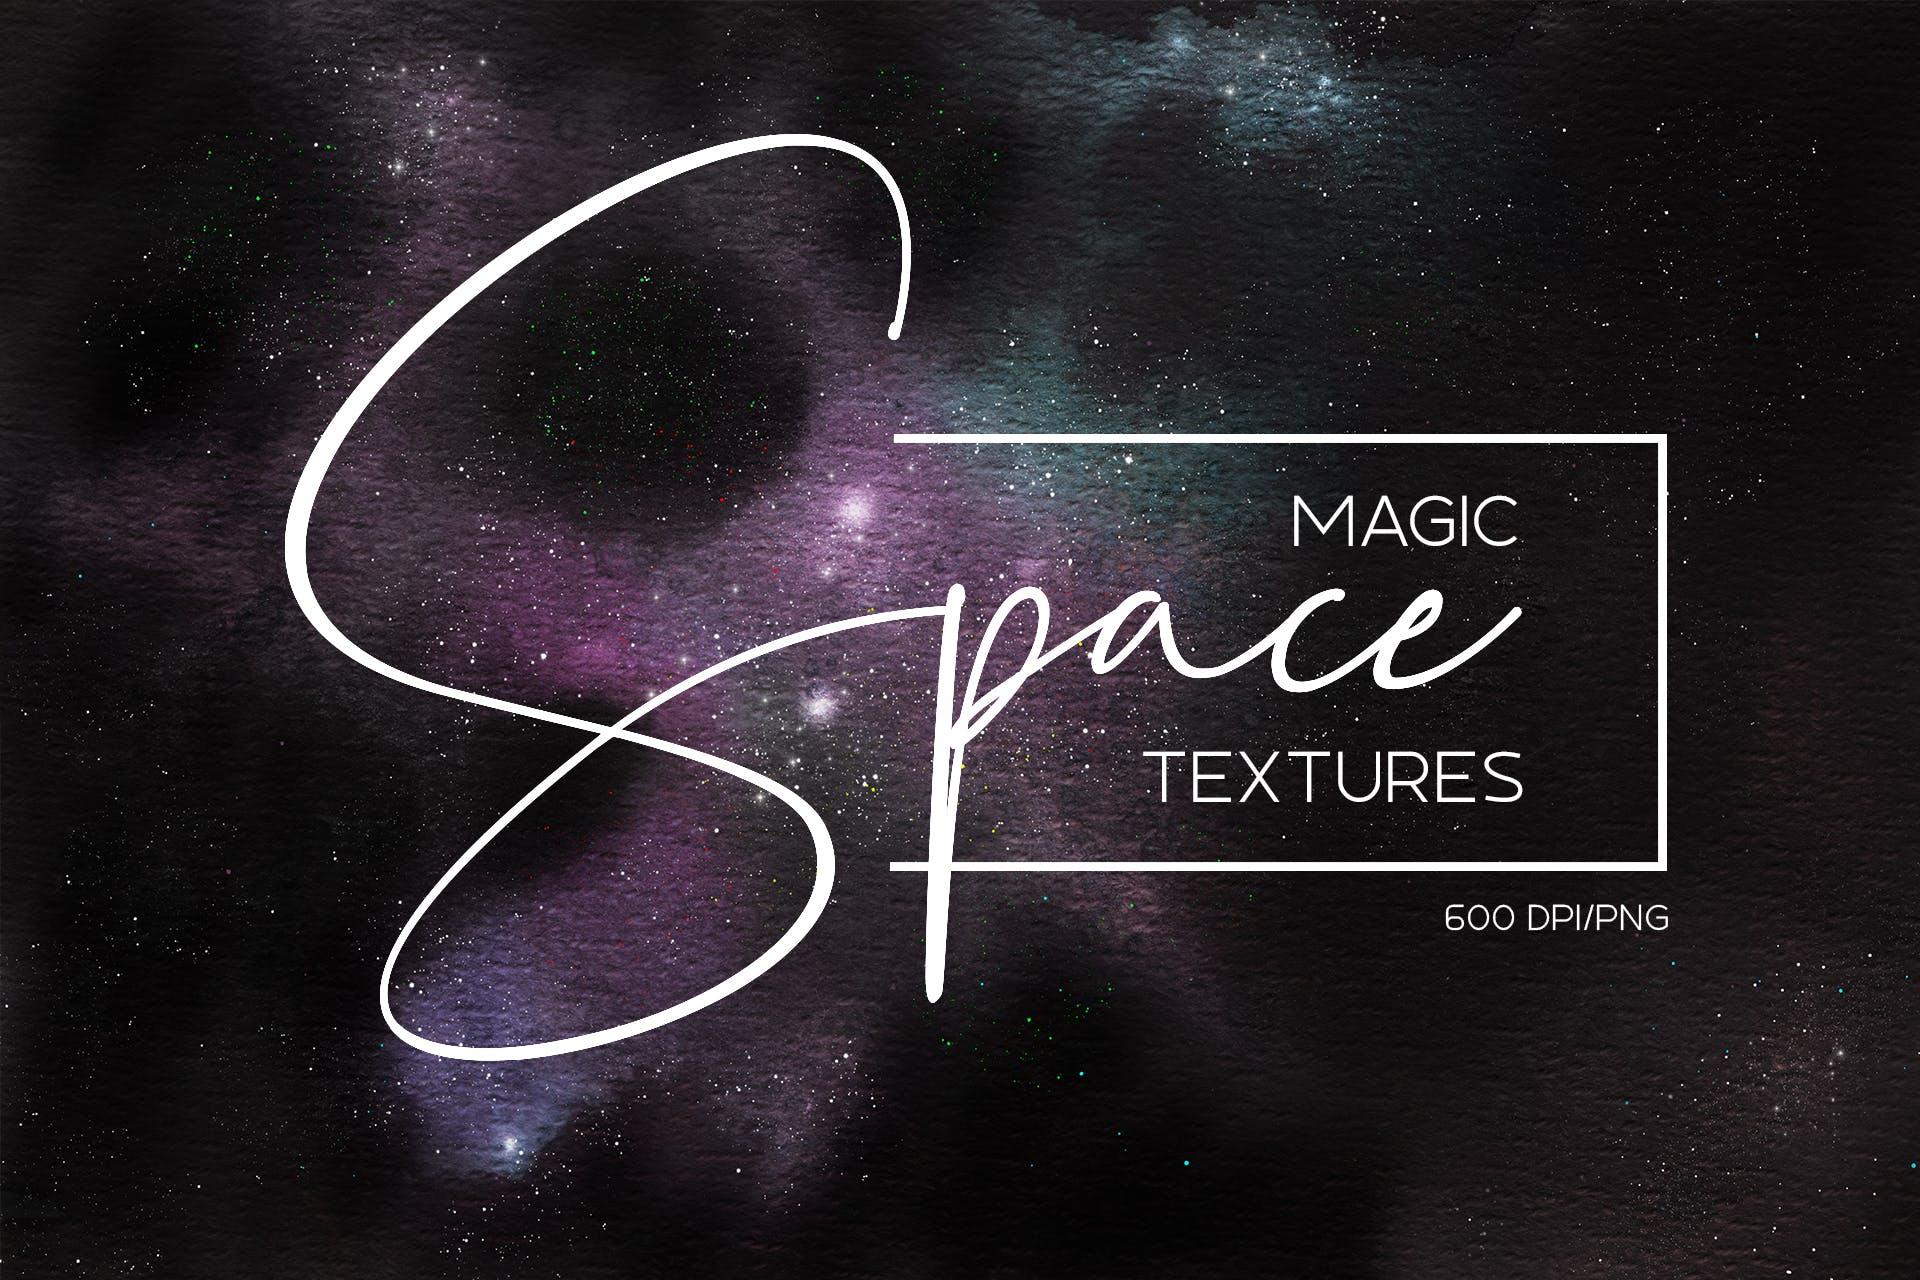 6款手绘神秘太空水彩剪贴画背景素材 Watercolor Space Cosmic Backgrounds Set插图